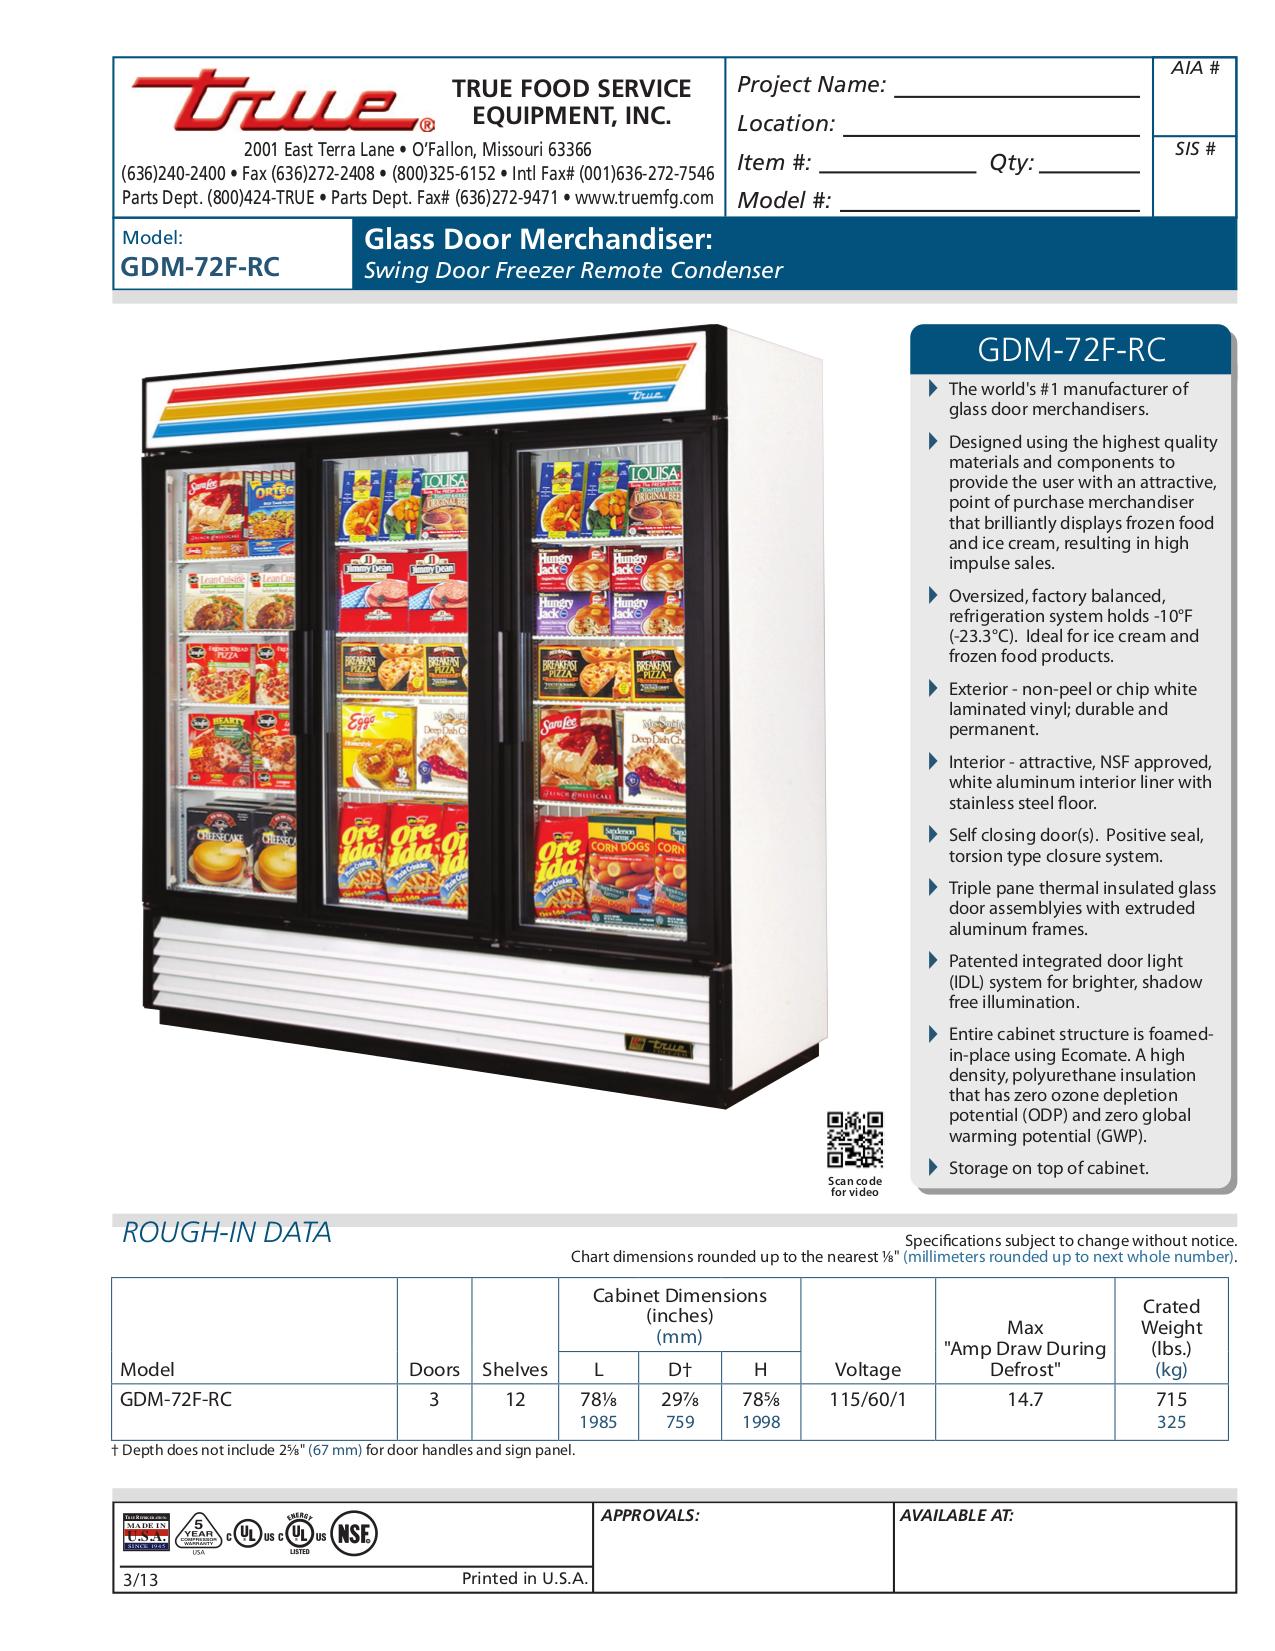 GDM 72F RC.pdf 0 download free pdf for true gdm 72f freezer manual gdm 72f wiring diagram at cos-gaming.co